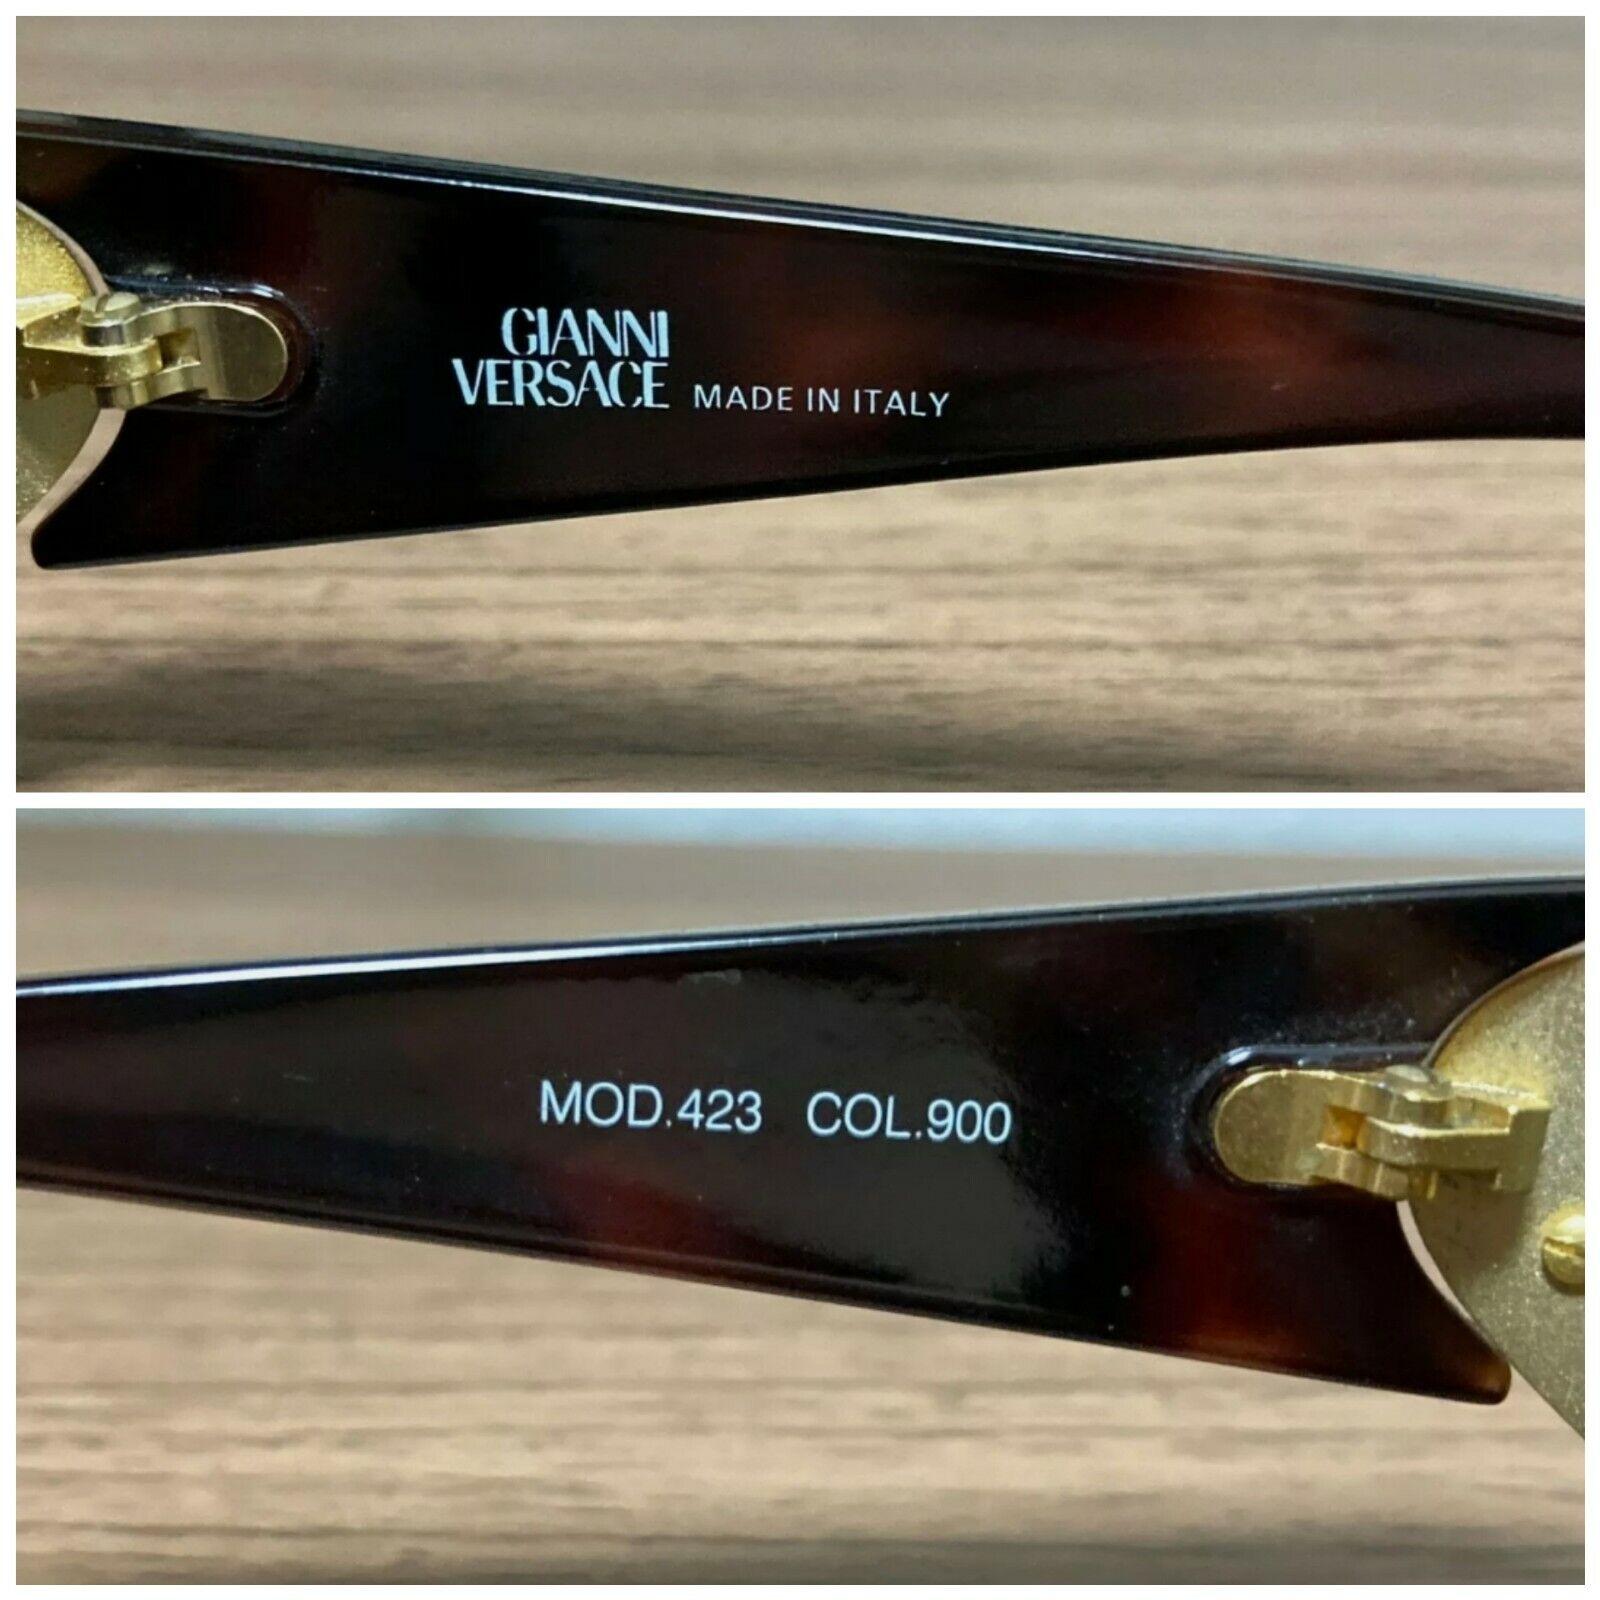 Gianni Versace Vintage Sunglasses Mod 423 - image 4